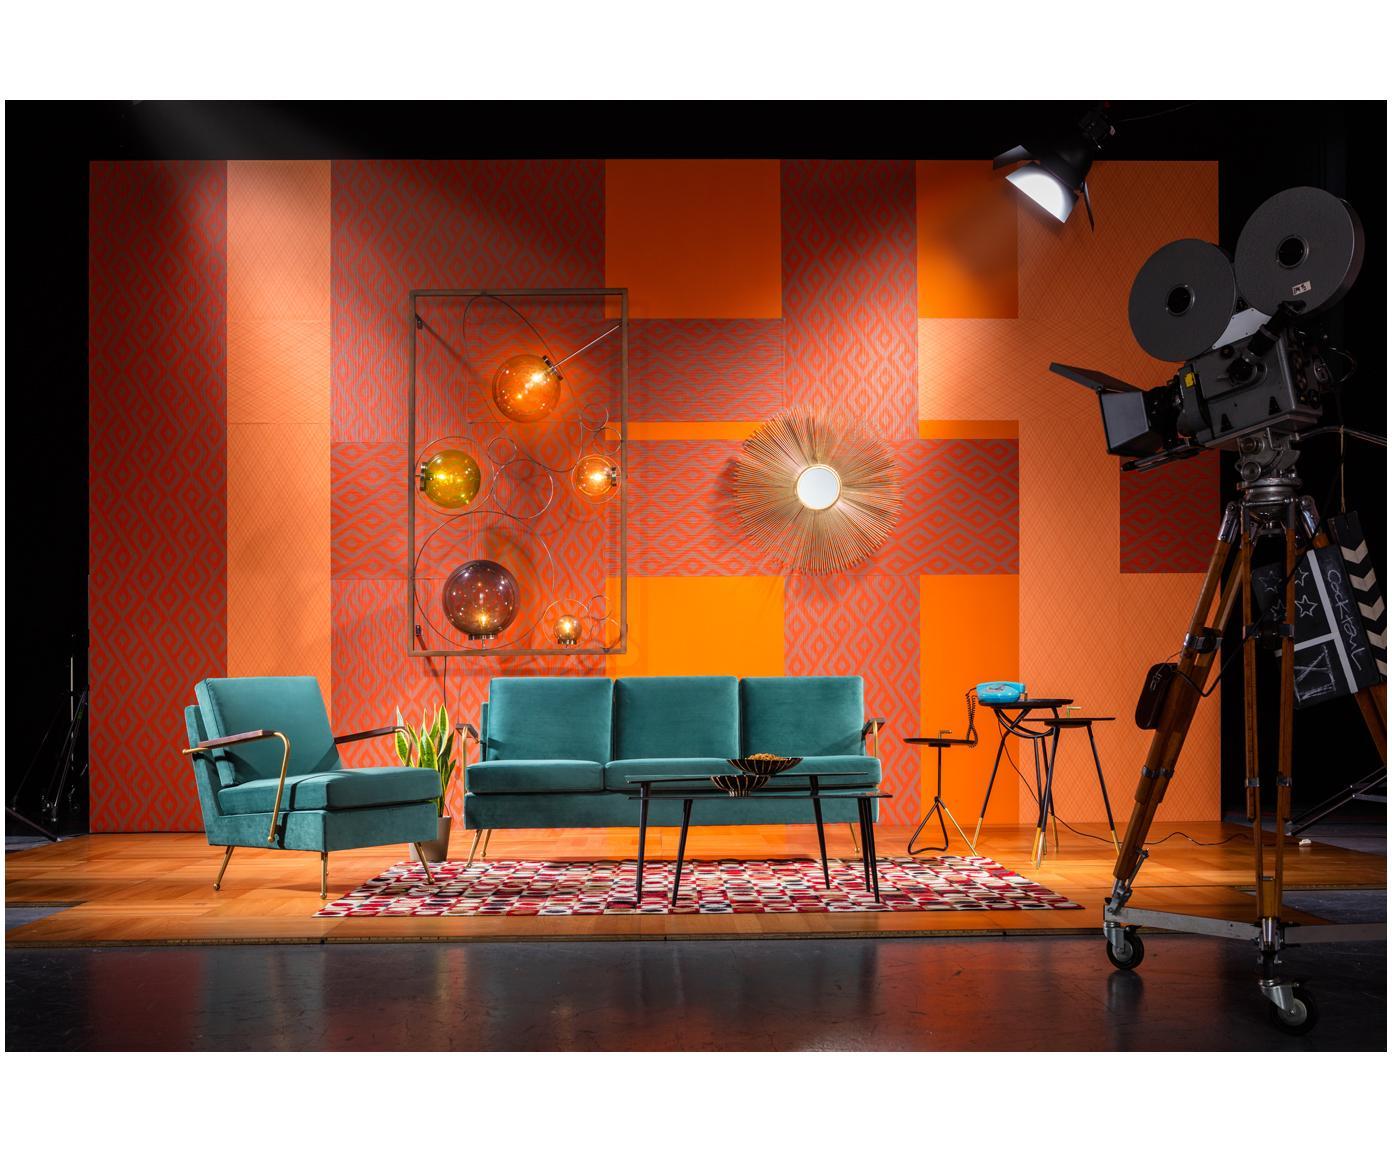 Samt-Sofa Gamble (3-Sitzer), Bezug: Polyestersamt 100.000 Sch, Korpus: Kiefernholz, unbehandelt, Grün, B 179 x T 75 cm